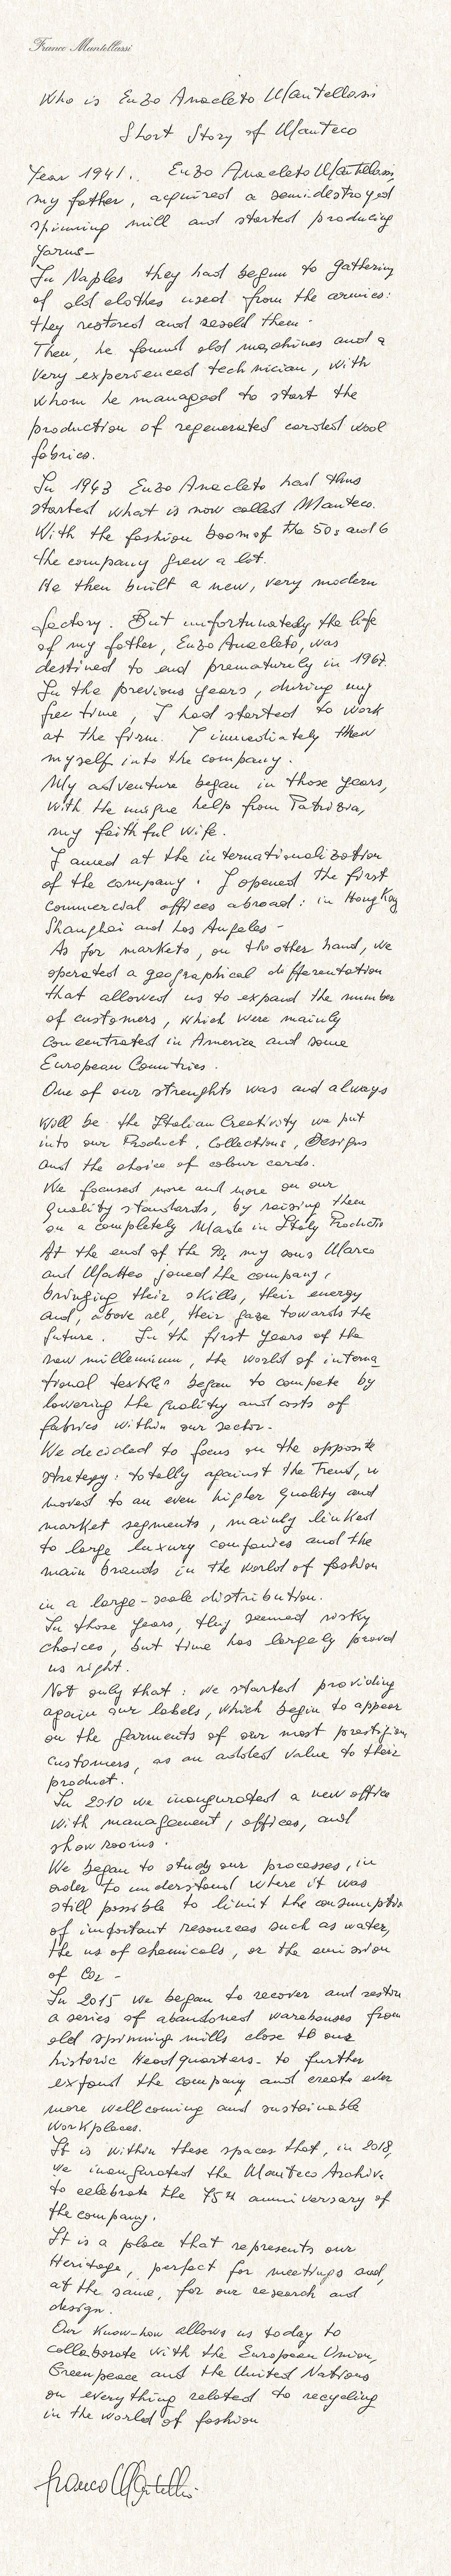 Mantellassi letter